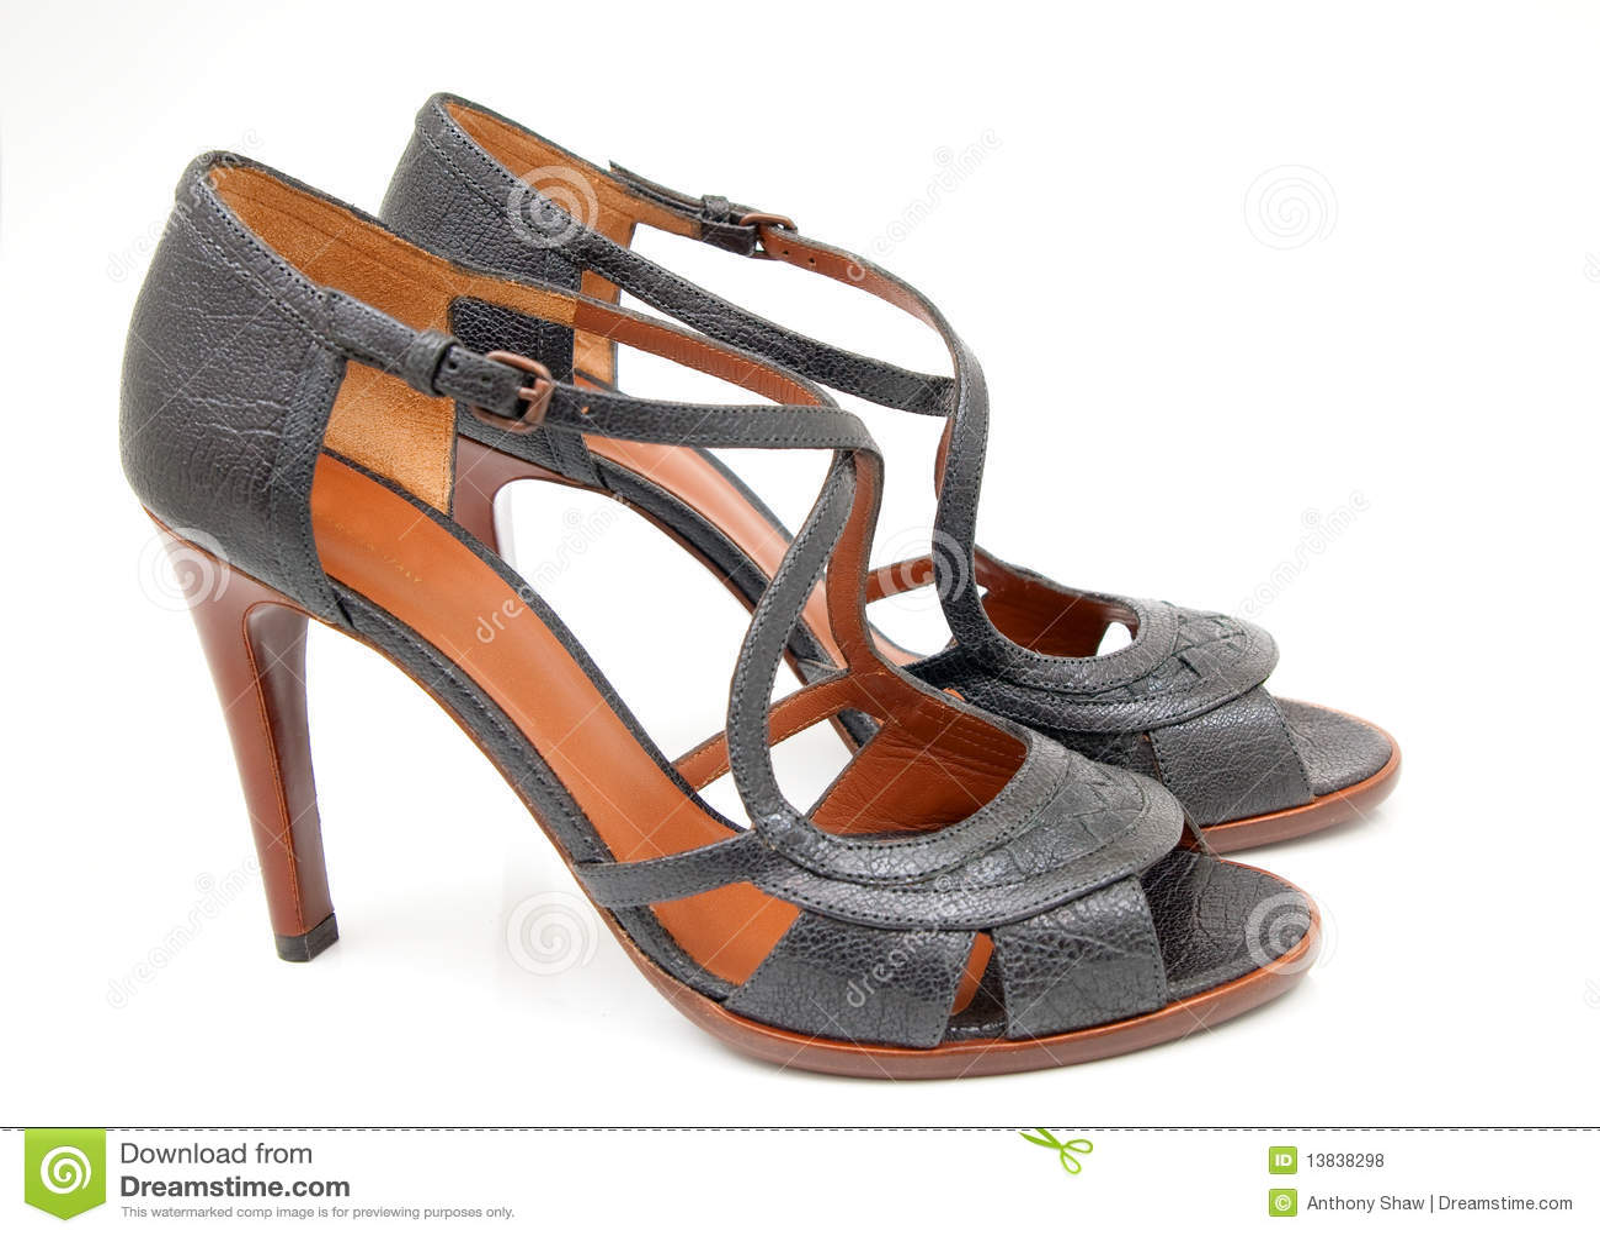 Royalty Free Stock Photos: Women s Italian Summer shoes